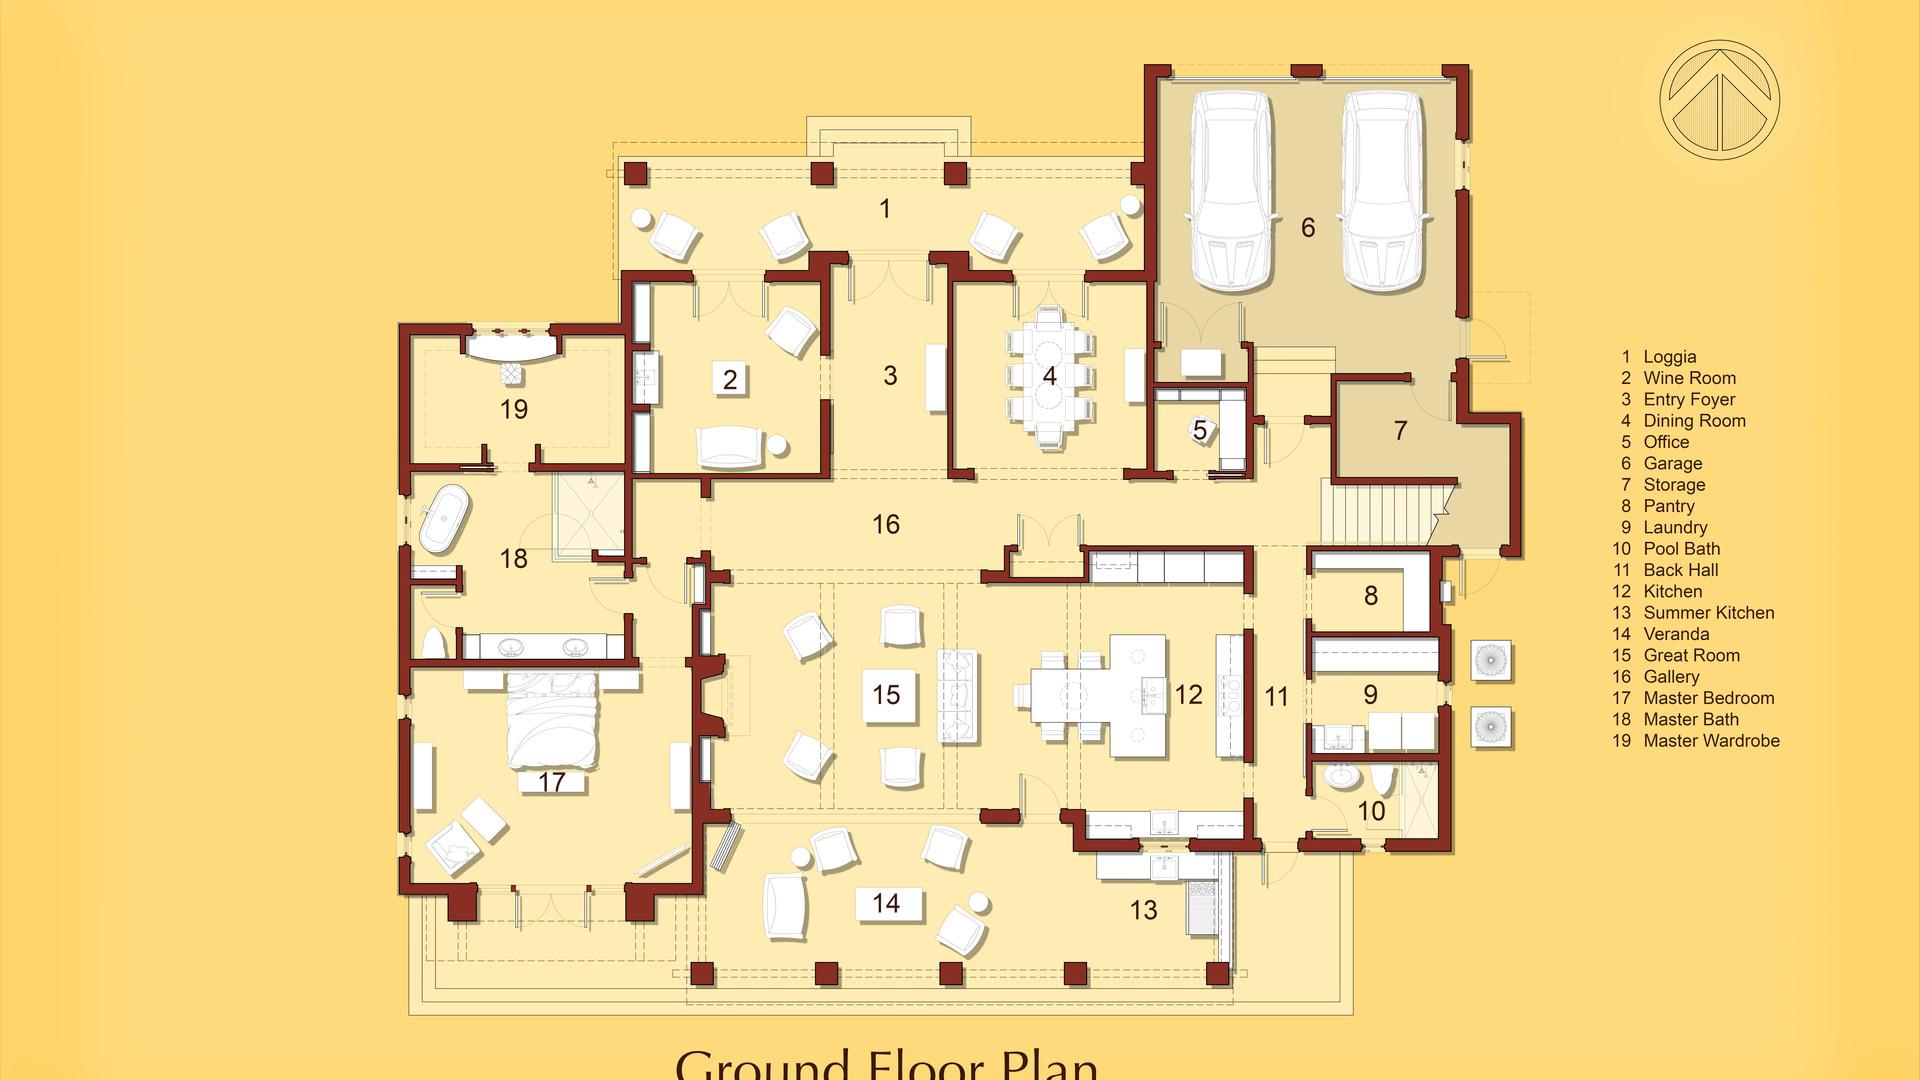 CPV-Ground Floor Plan.jpg